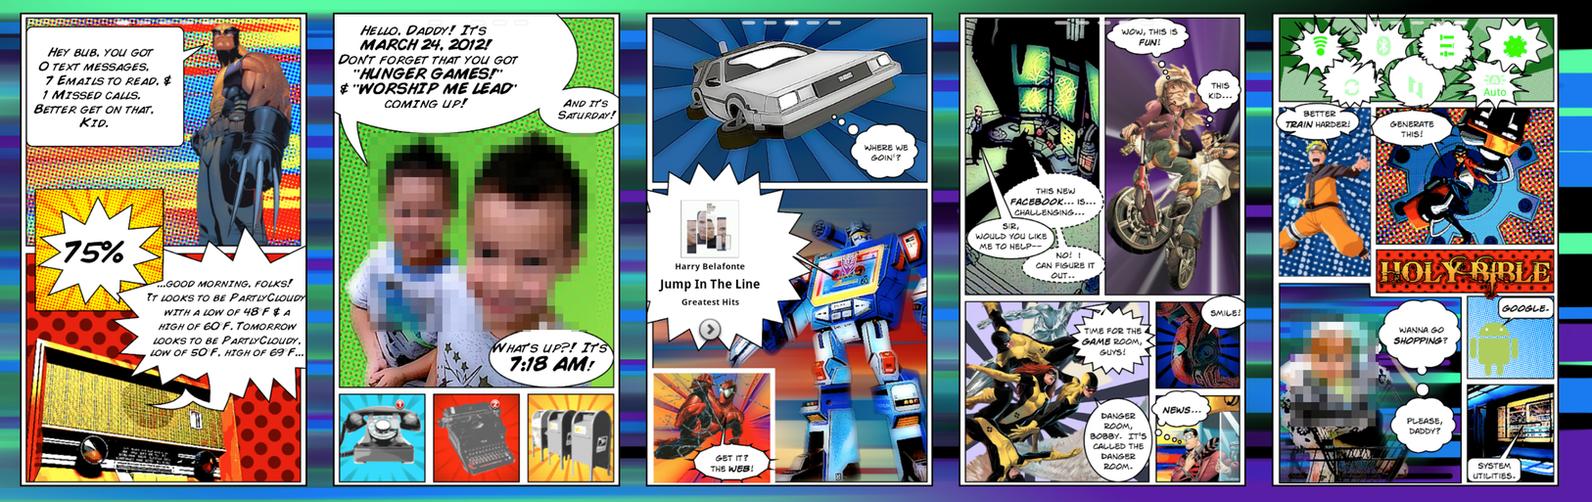 comic theme funkpod style by funkpod on deviantart